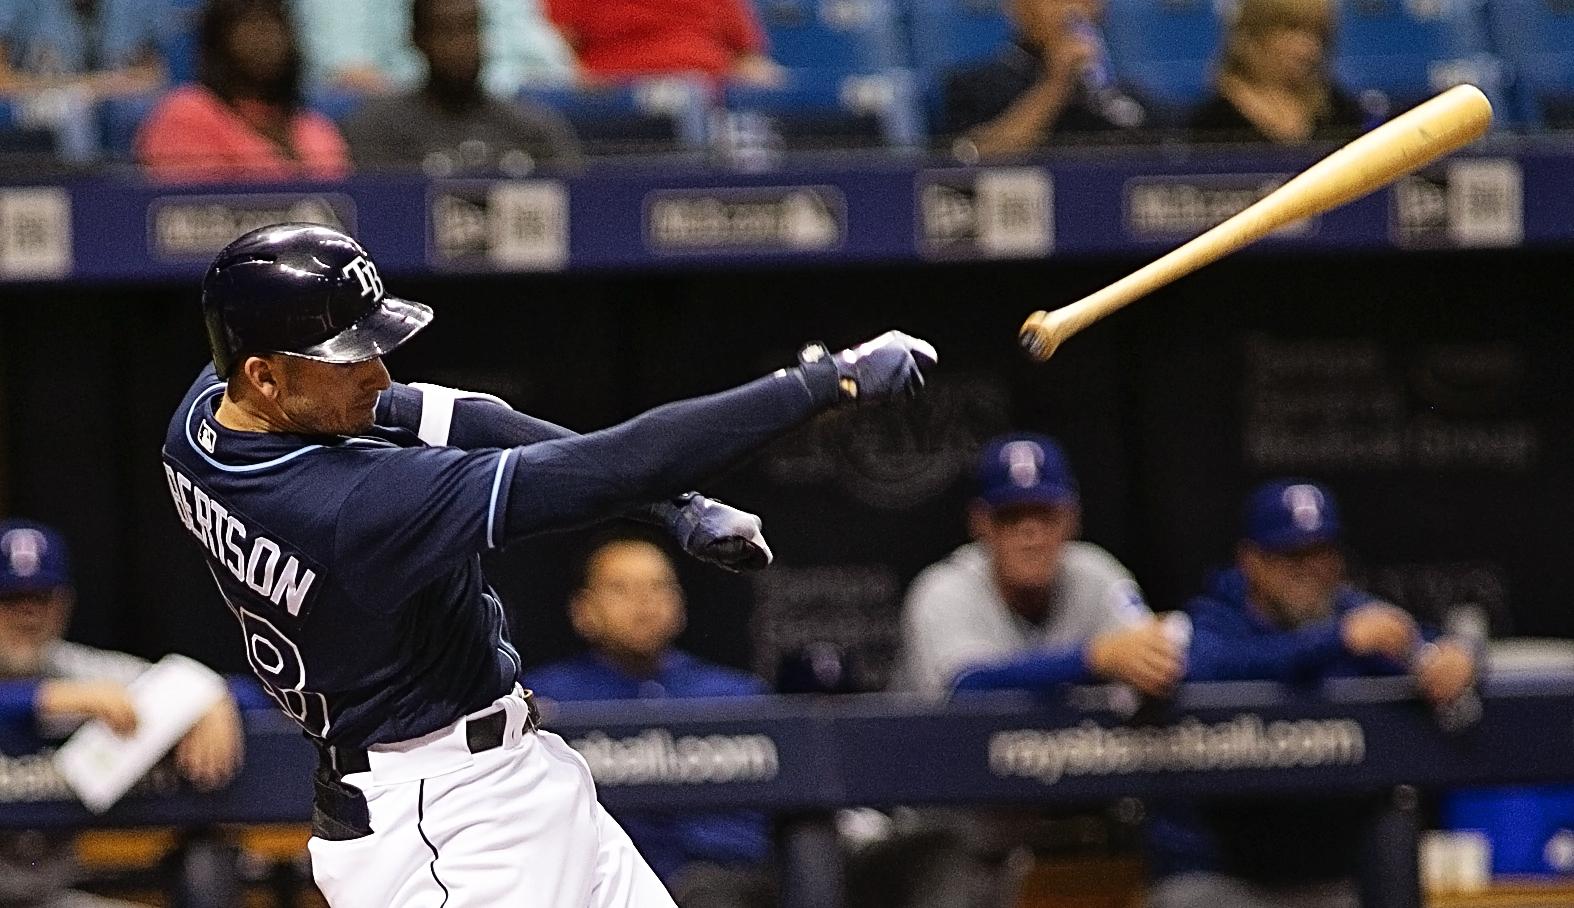 The bat gets away from Daniel Robertson./CARMEN MANDATO